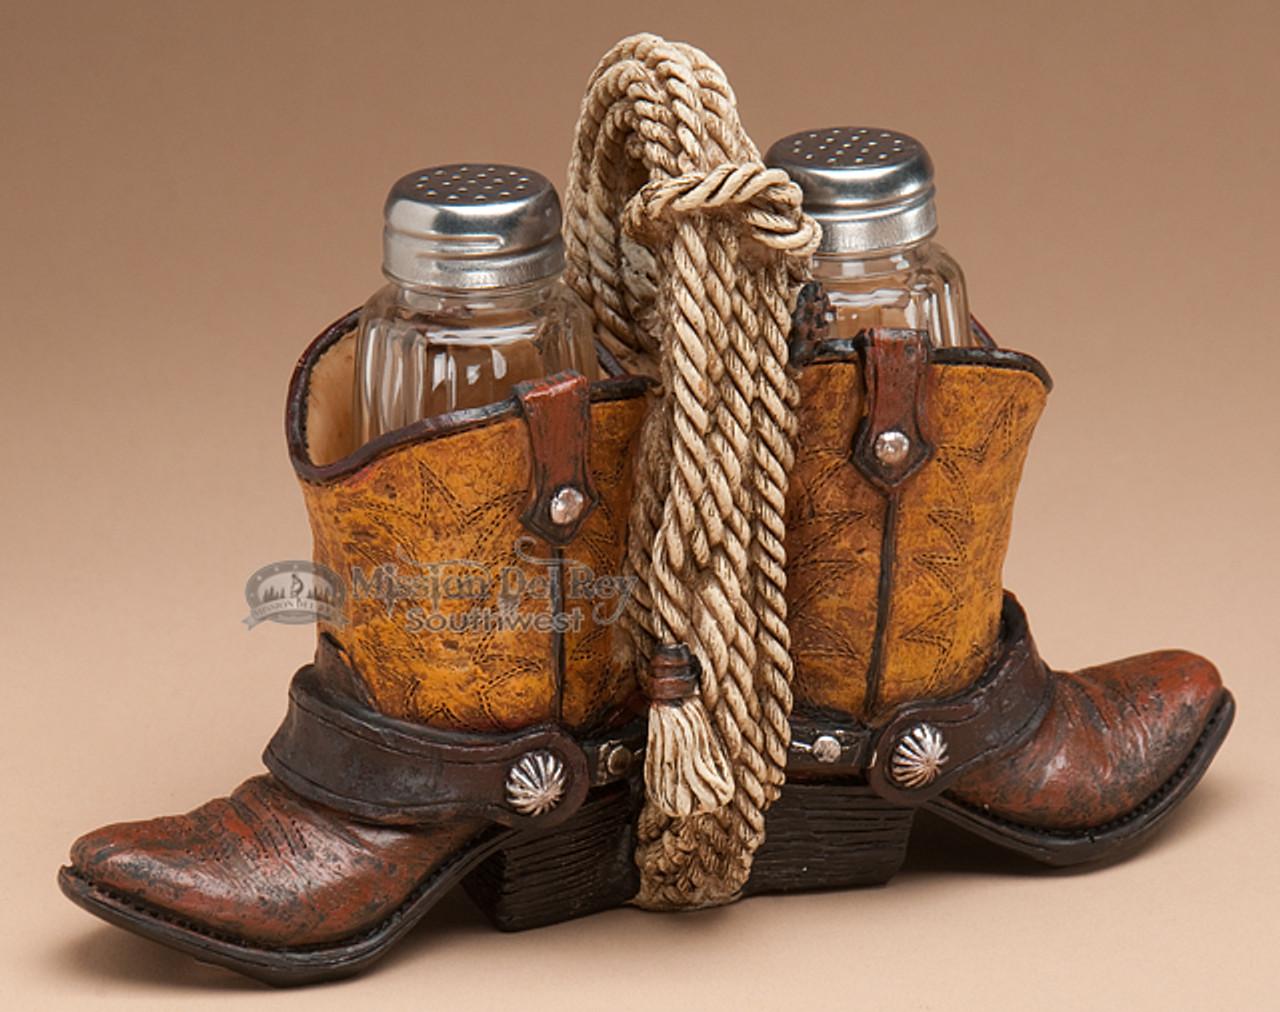 0d5a673236c Western Salt & Pepper Shakers -Cowboy Boots & Rope